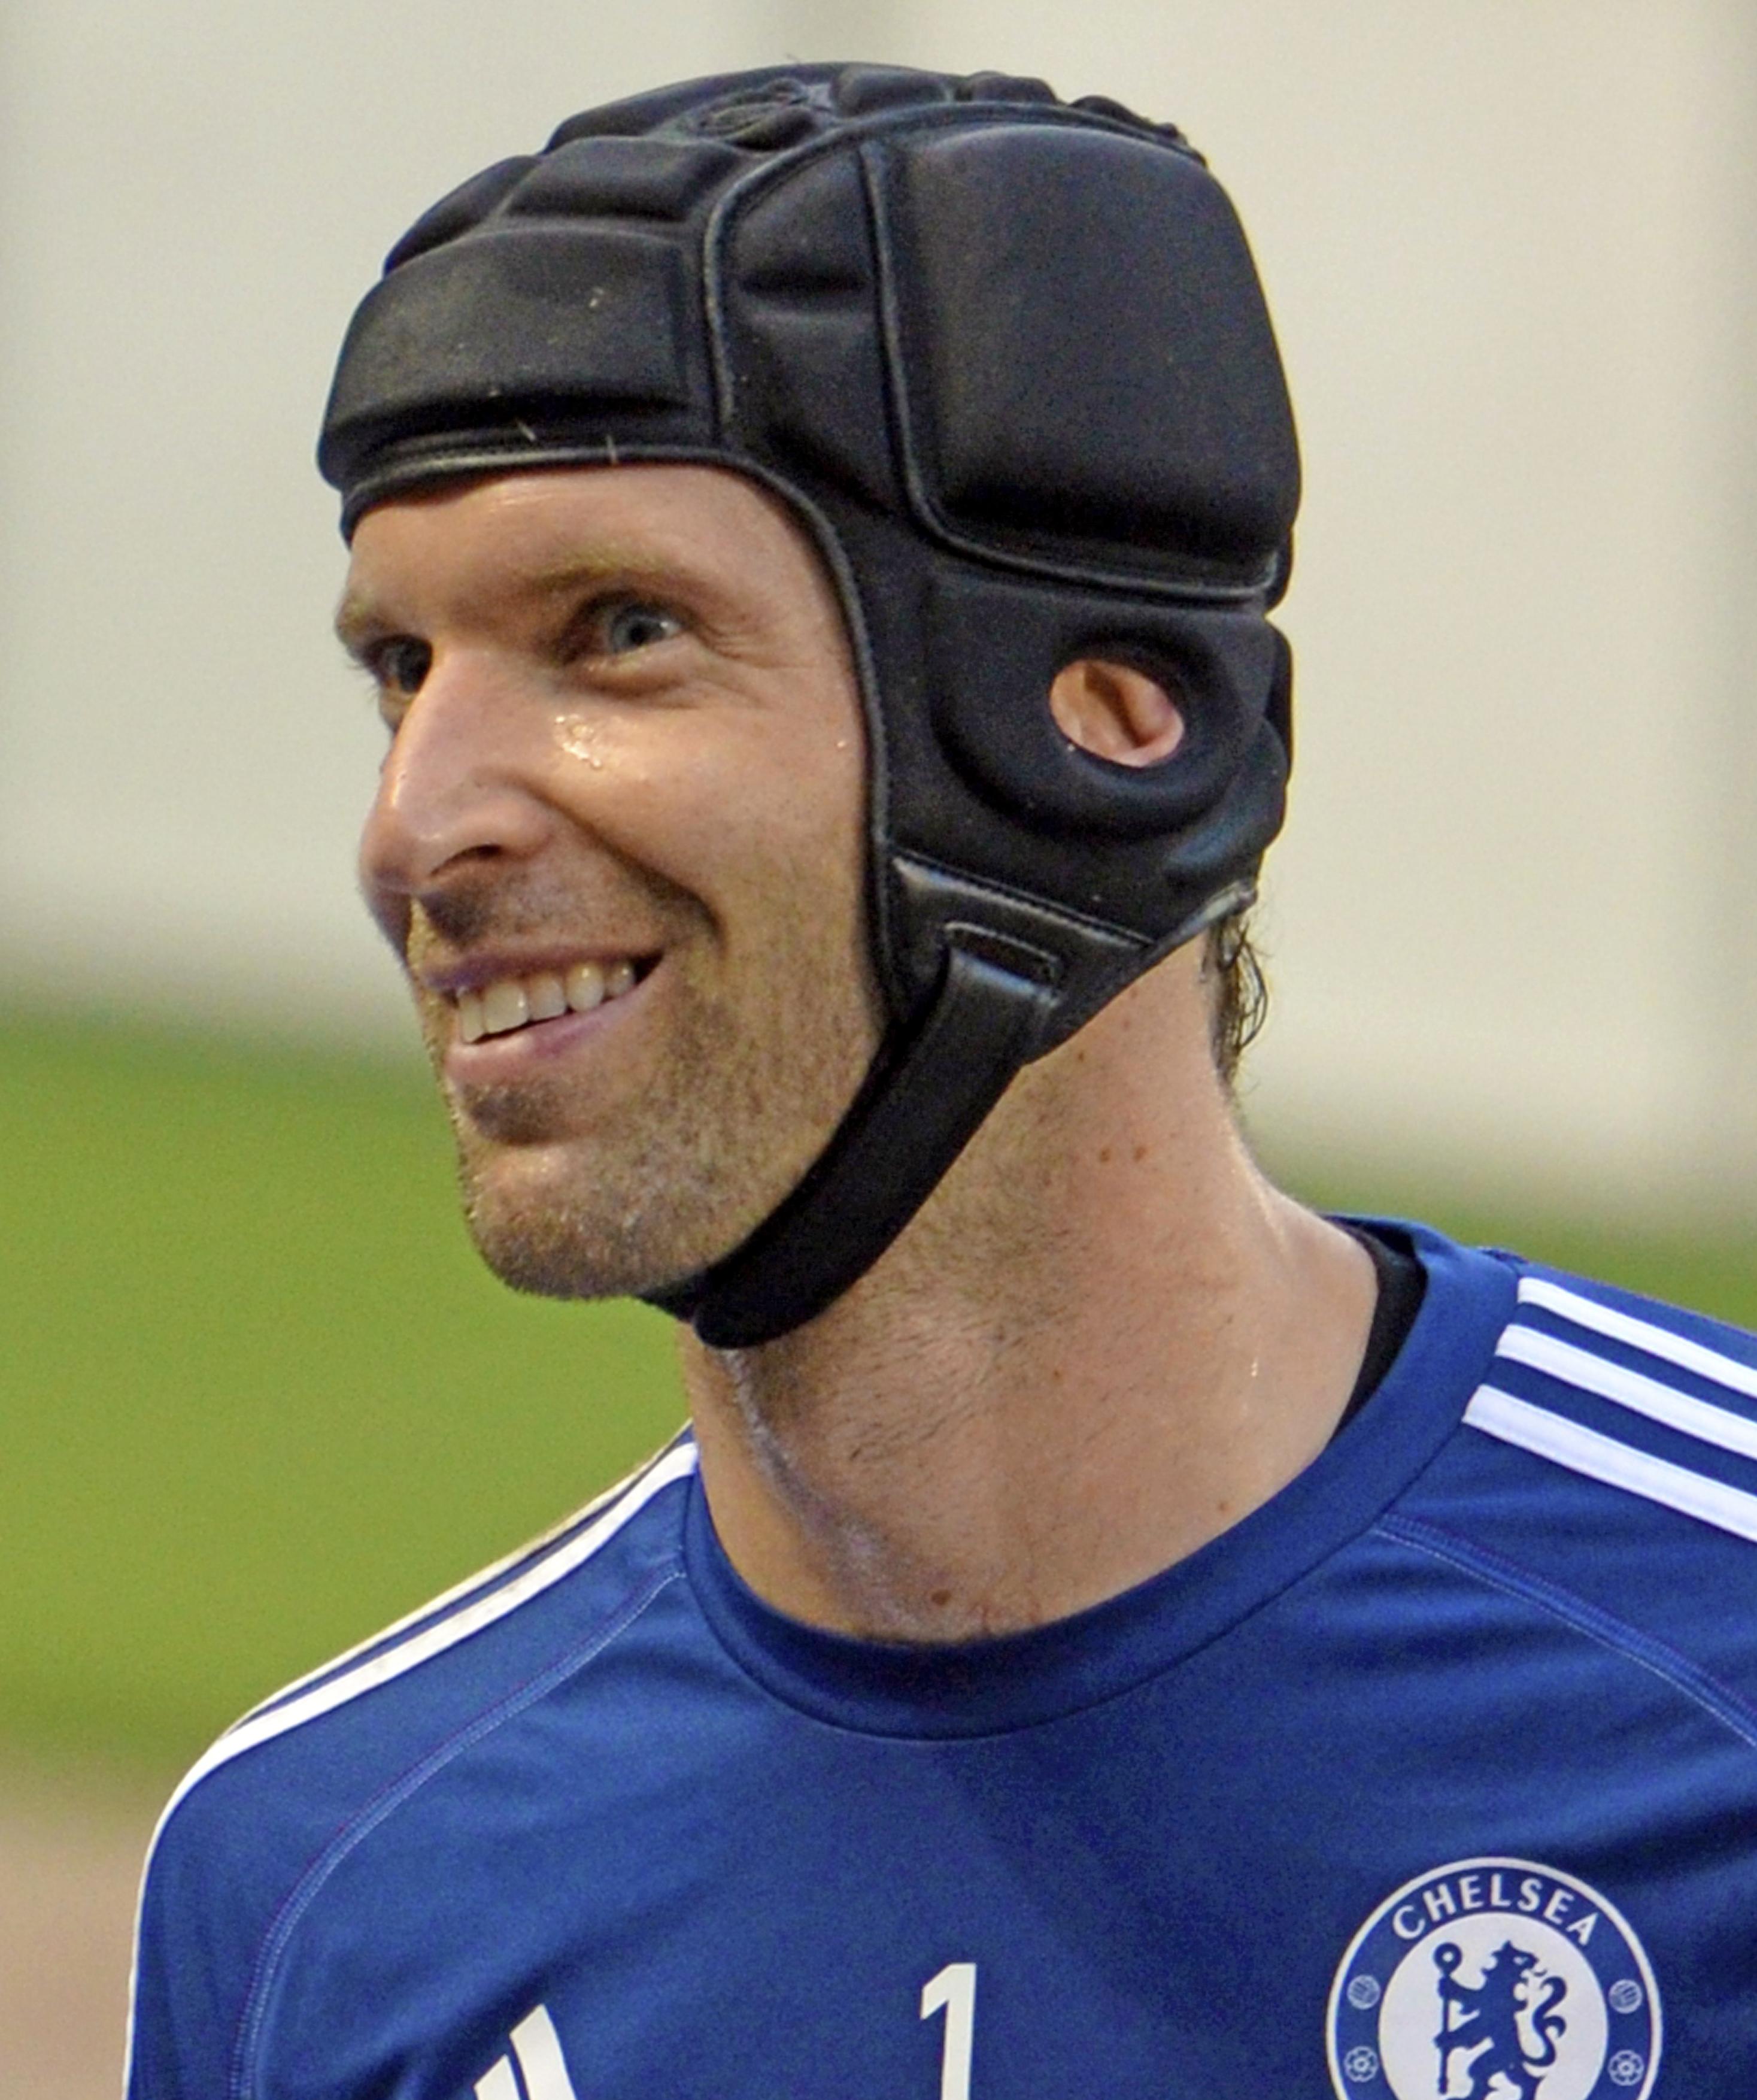 39-år gammel 196 cm høy Petr Cech i 2021